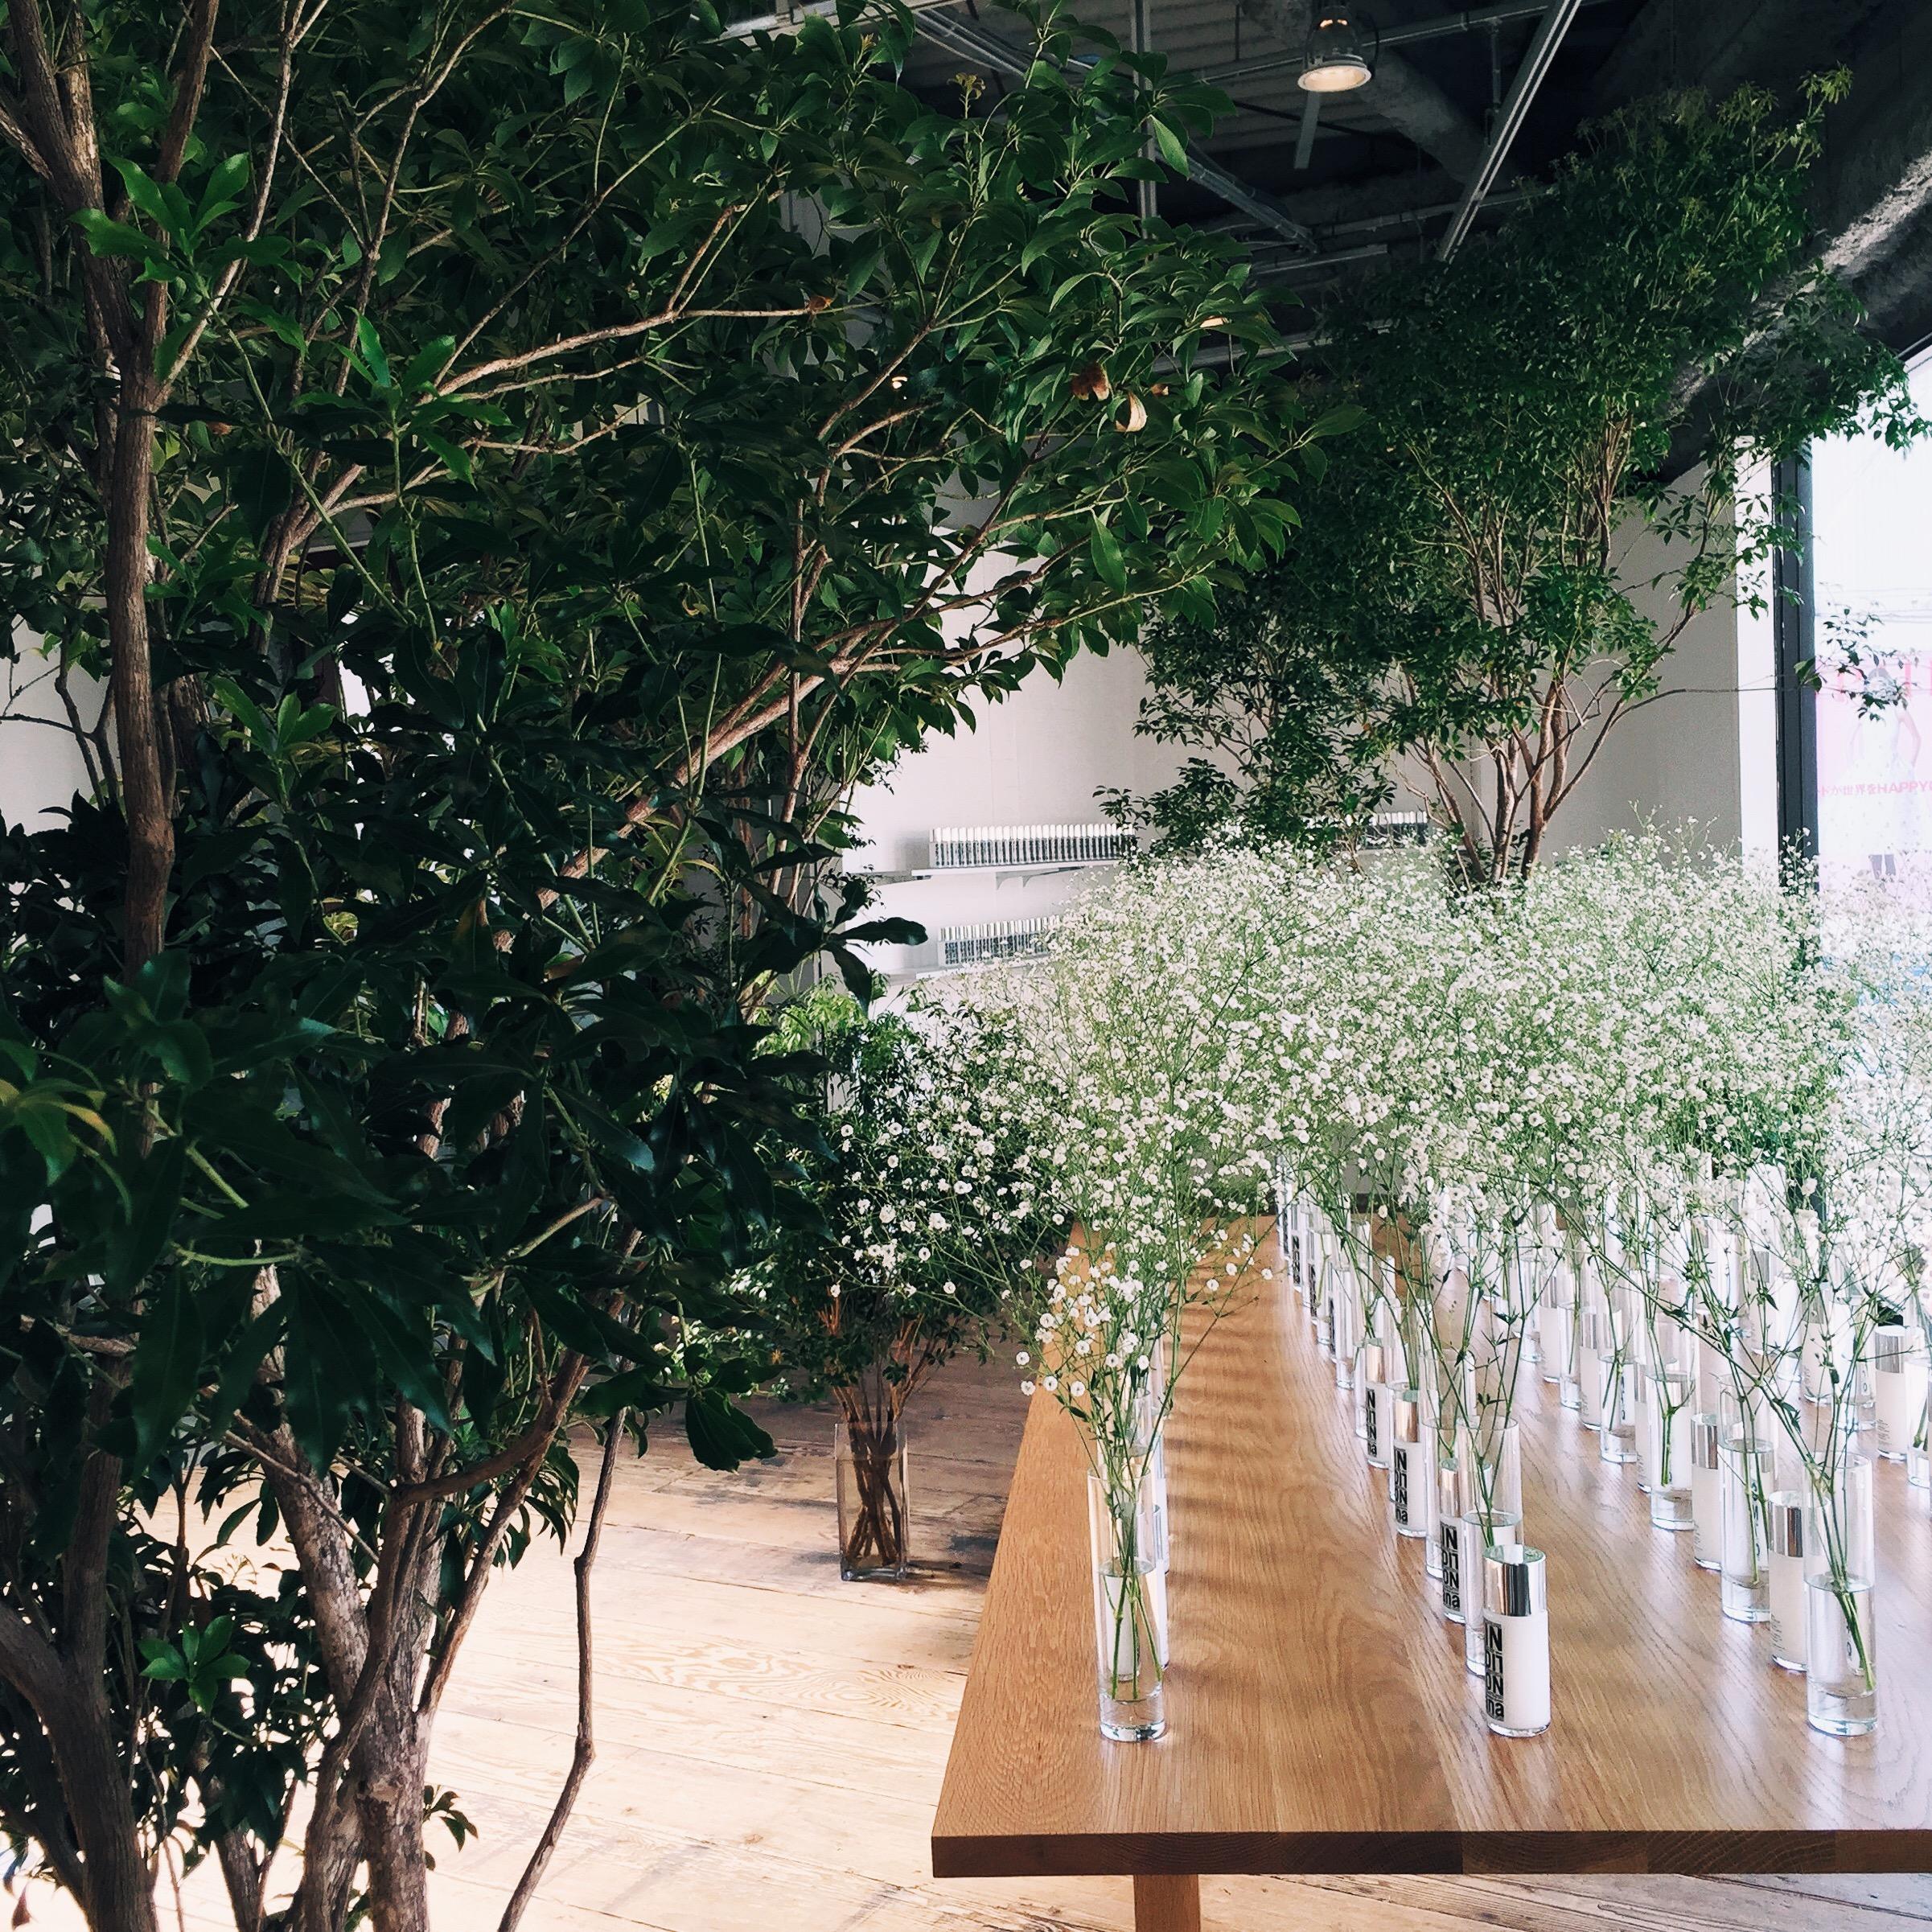 Organized plants